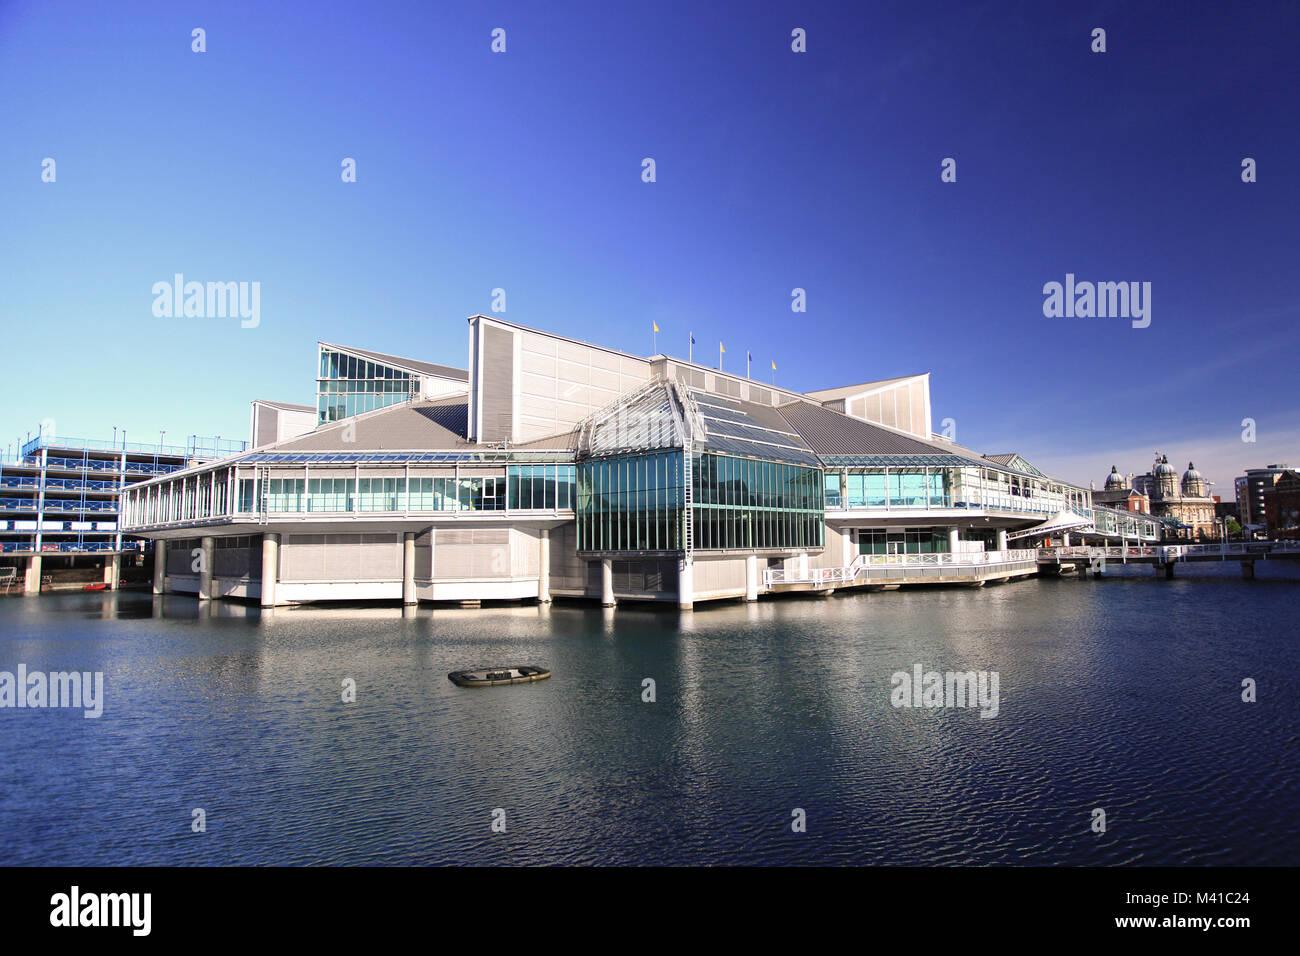 El centro comercial de Princes Quay, Princes Dock Street, Hull, Reino Unido Foto de stock